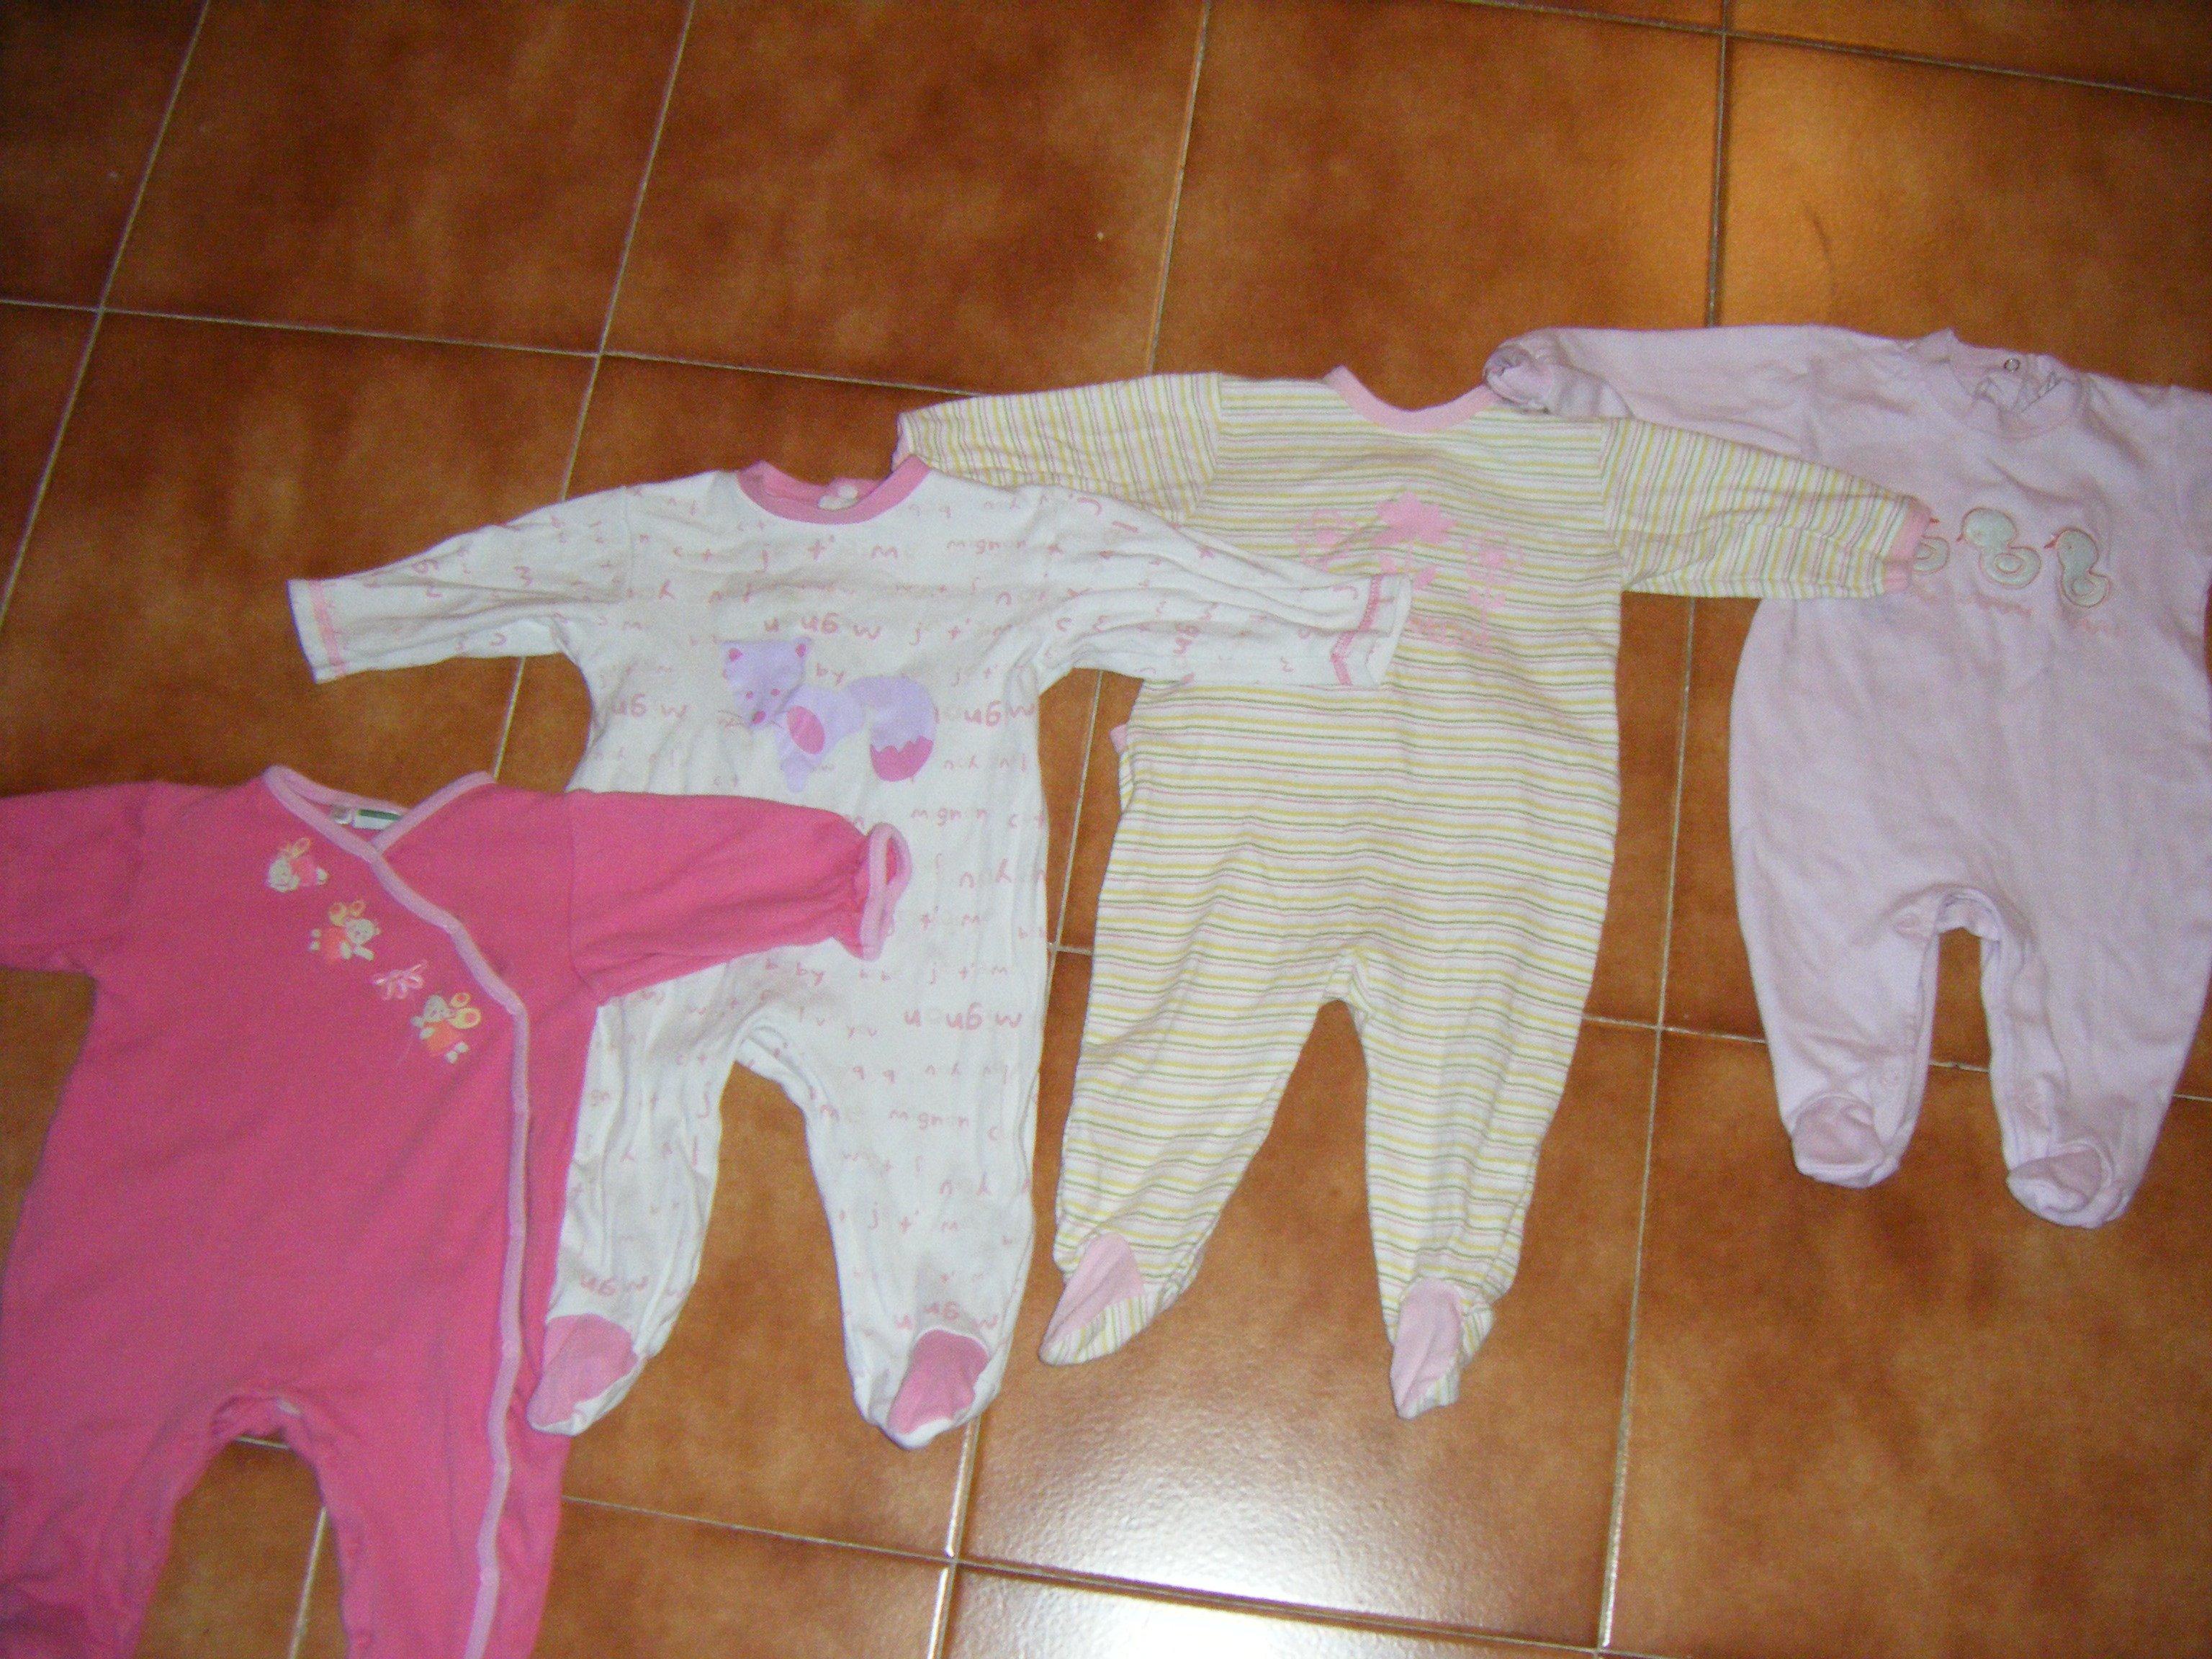 pijama coton au choix 2euros vetement b b fille 9 mois angielina photos club doctissimo. Black Bedroom Furniture Sets. Home Design Ideas